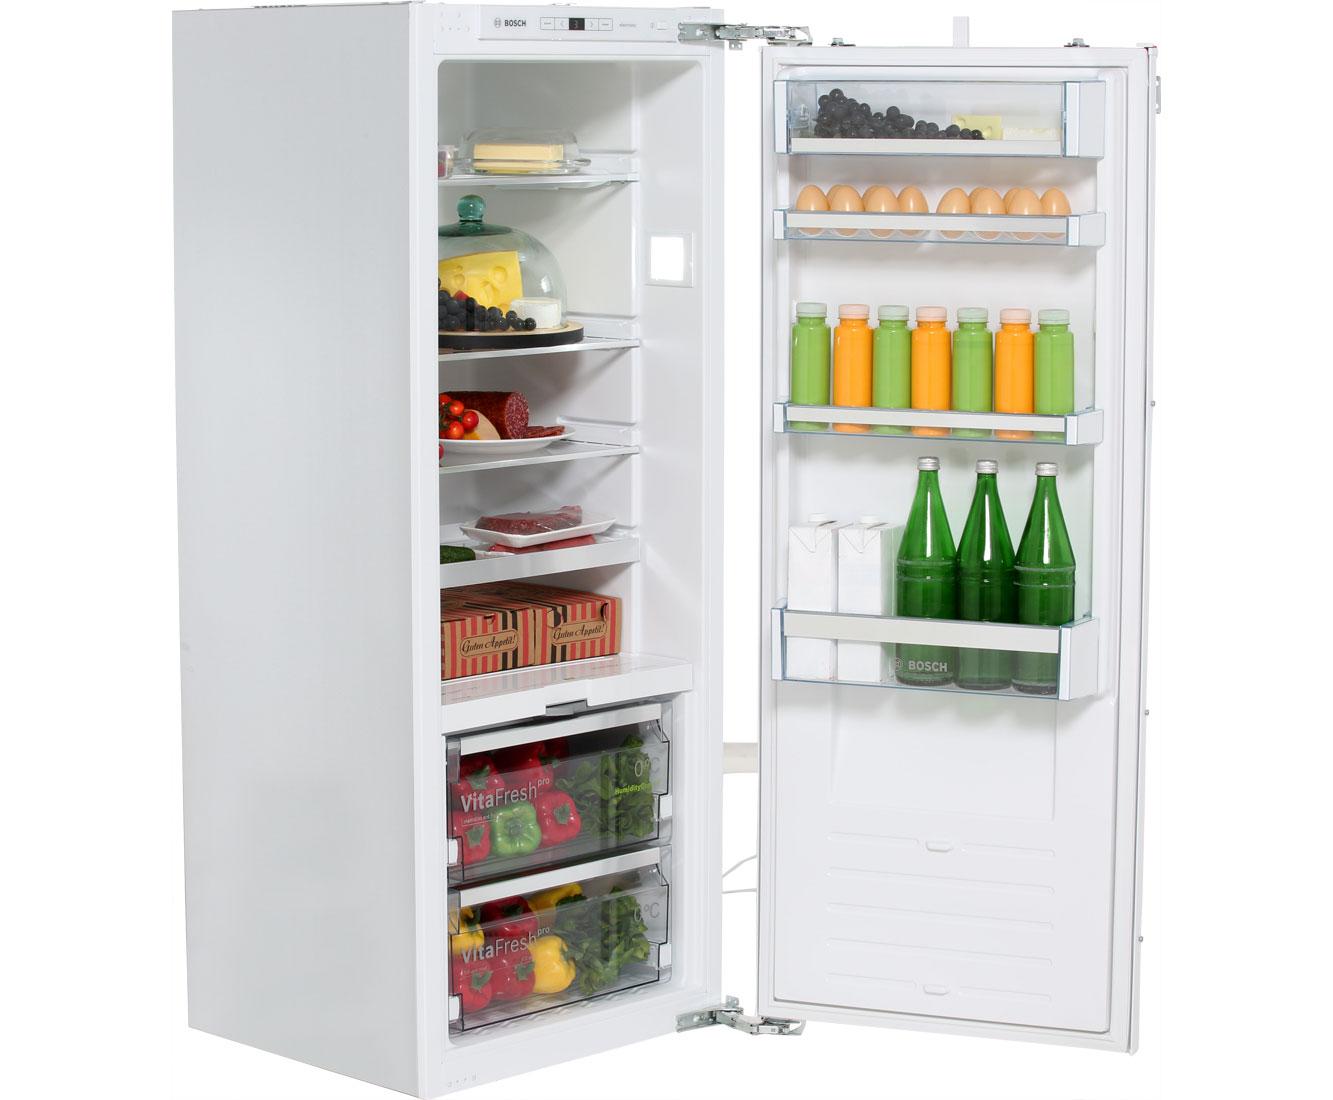 Bosch Kühlschrank Innen Nass : Bosch serie kif af einbau kühlschrank er nische festtür